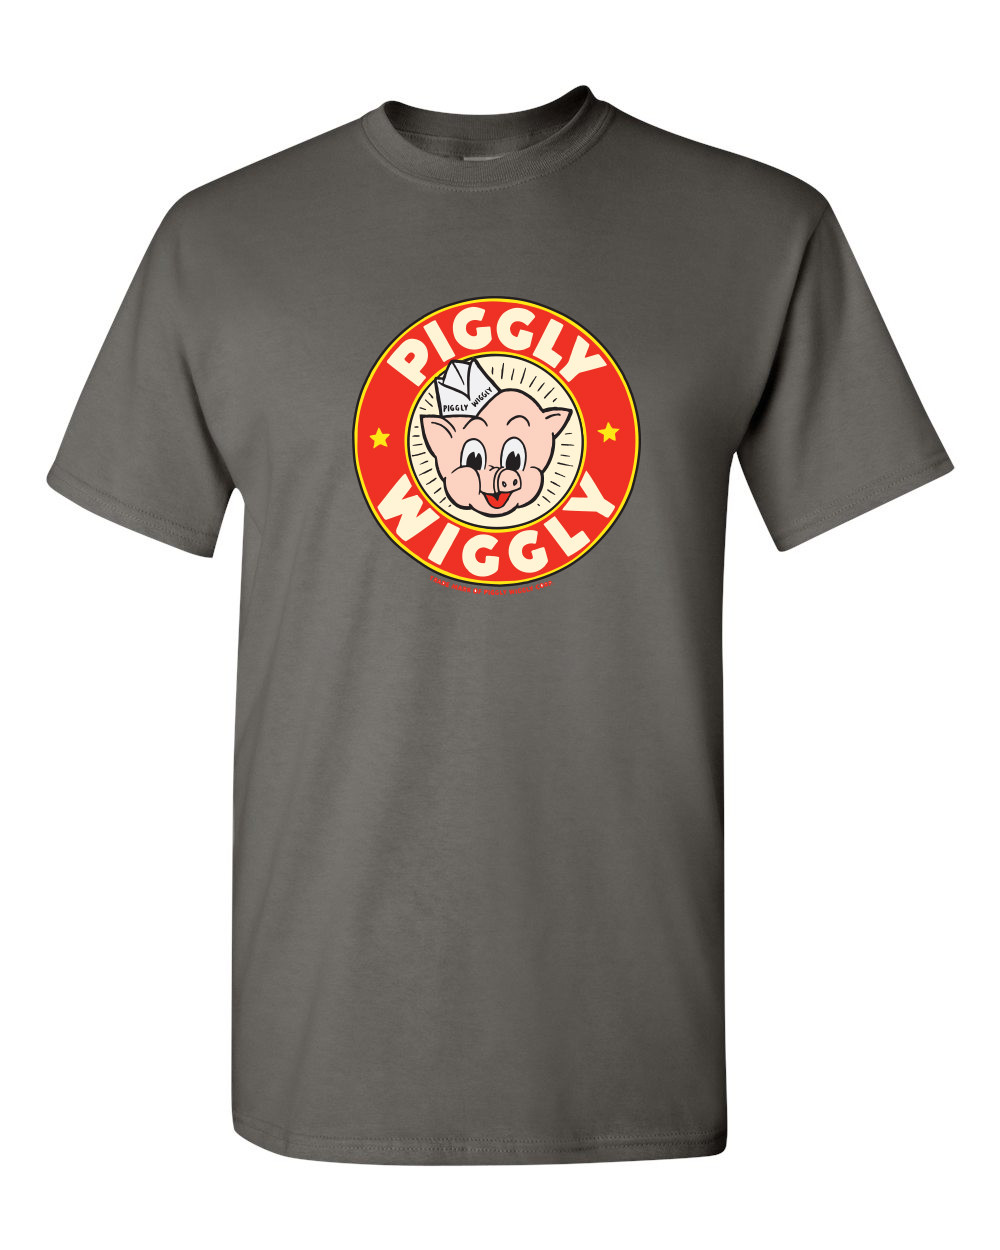 c3c05490 Classic Piggly Wiggly T-Shirt - NerdKungFu